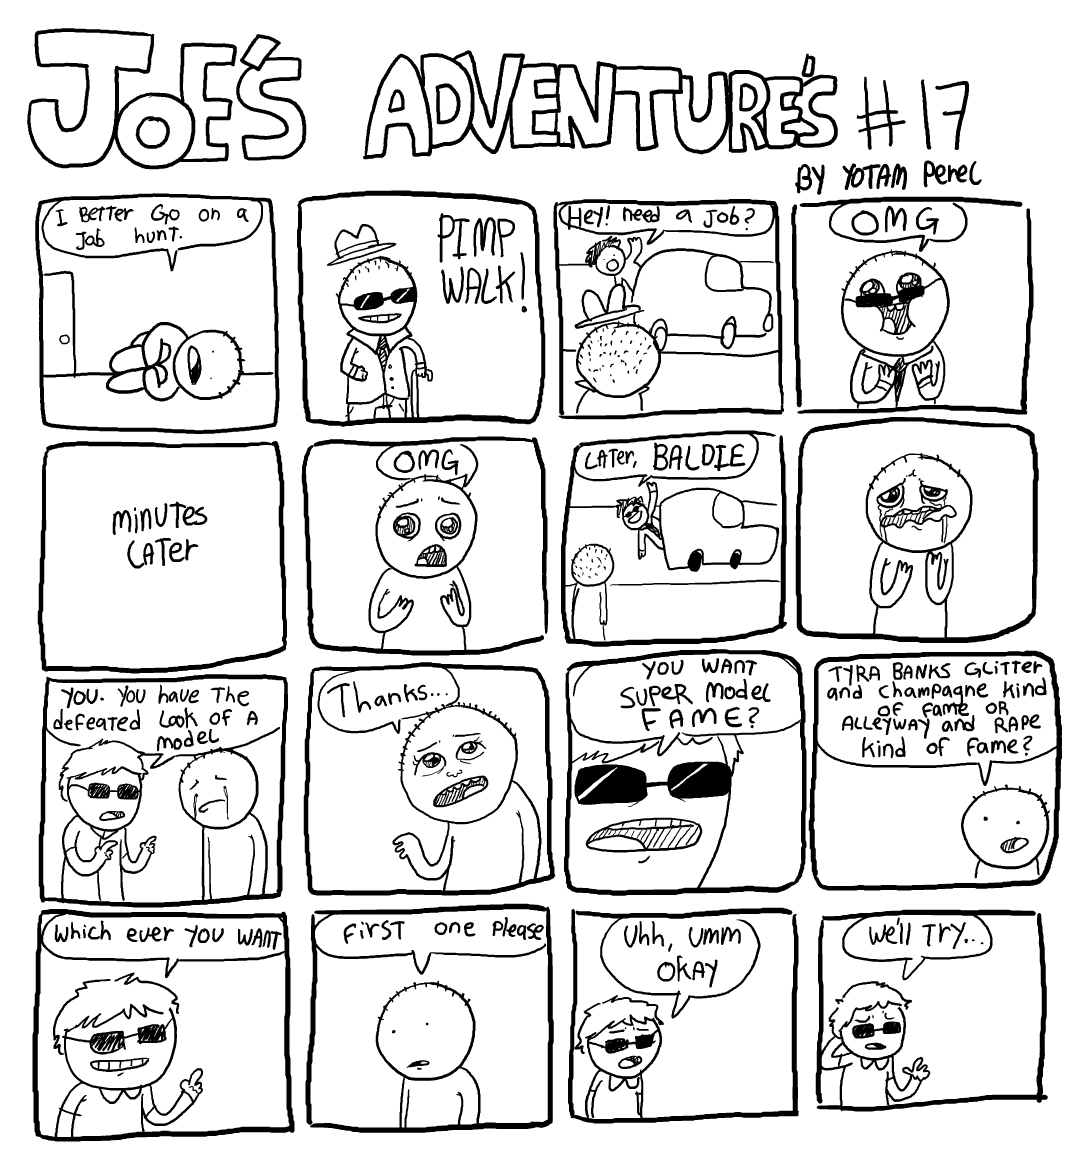 Joe's Adventure's